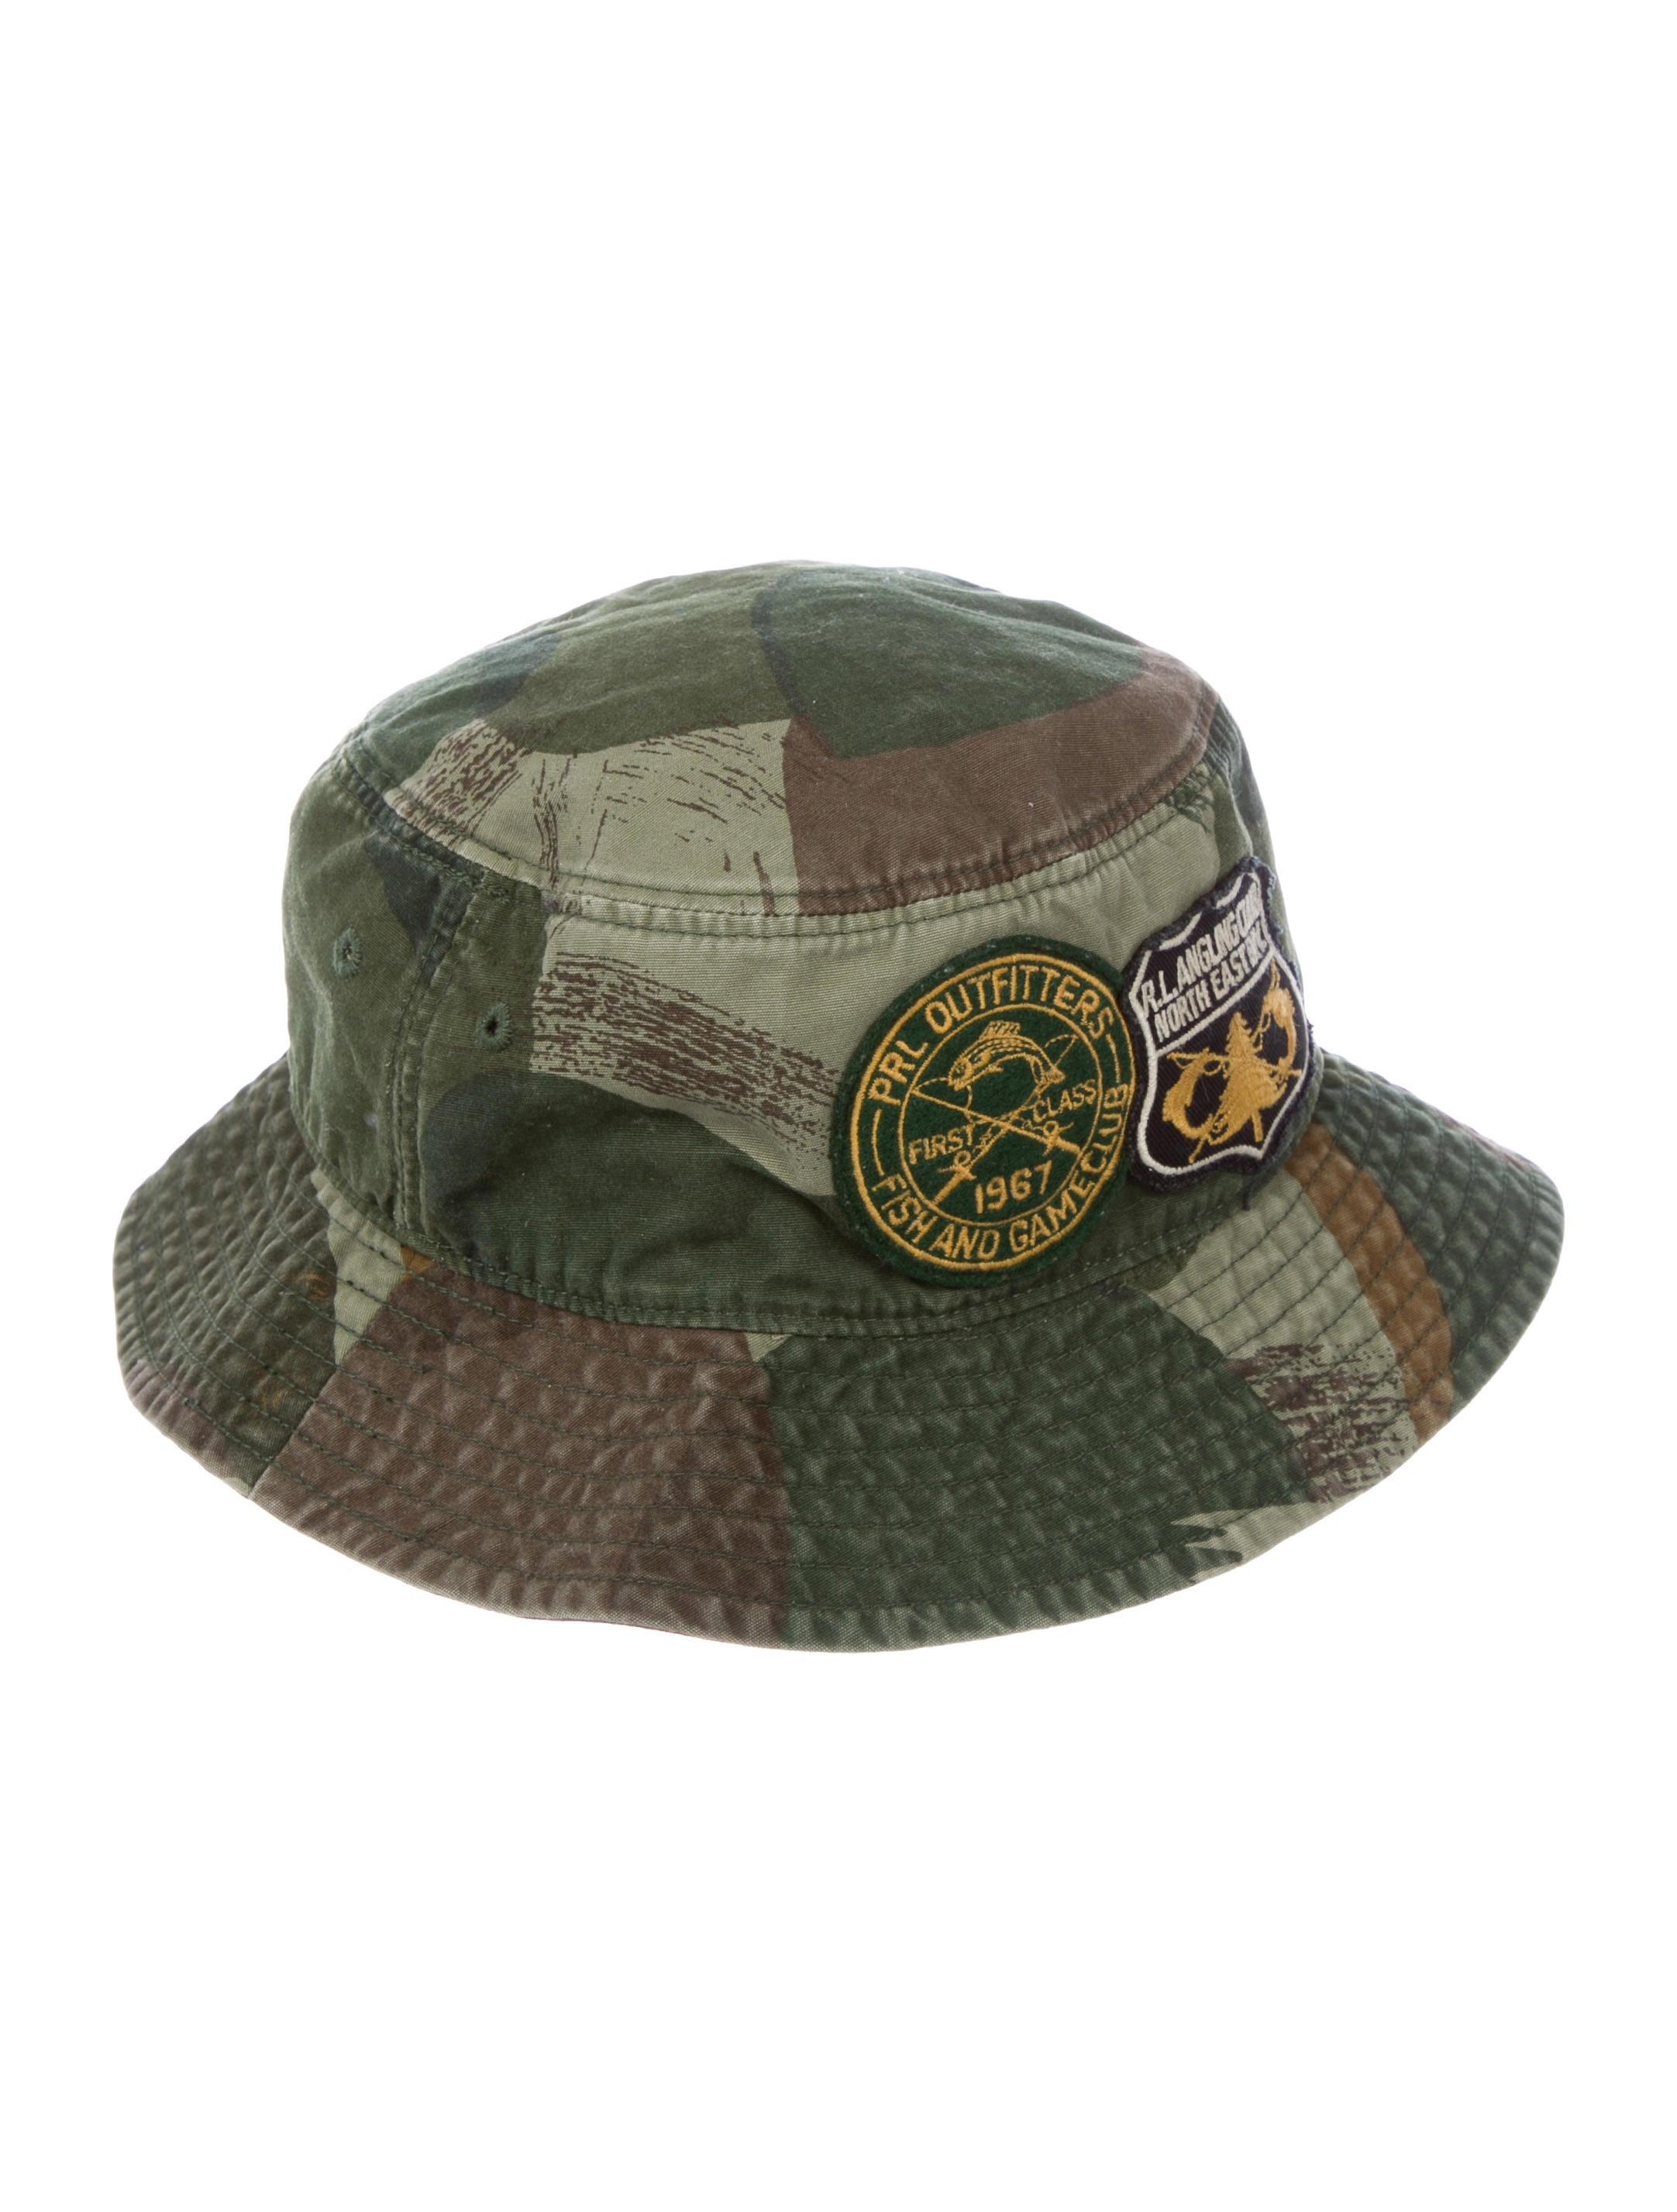 2a33305dae9 Polo Ralph Lauren Boys  Camo Bucket Hat - Boys - WPRLN21350